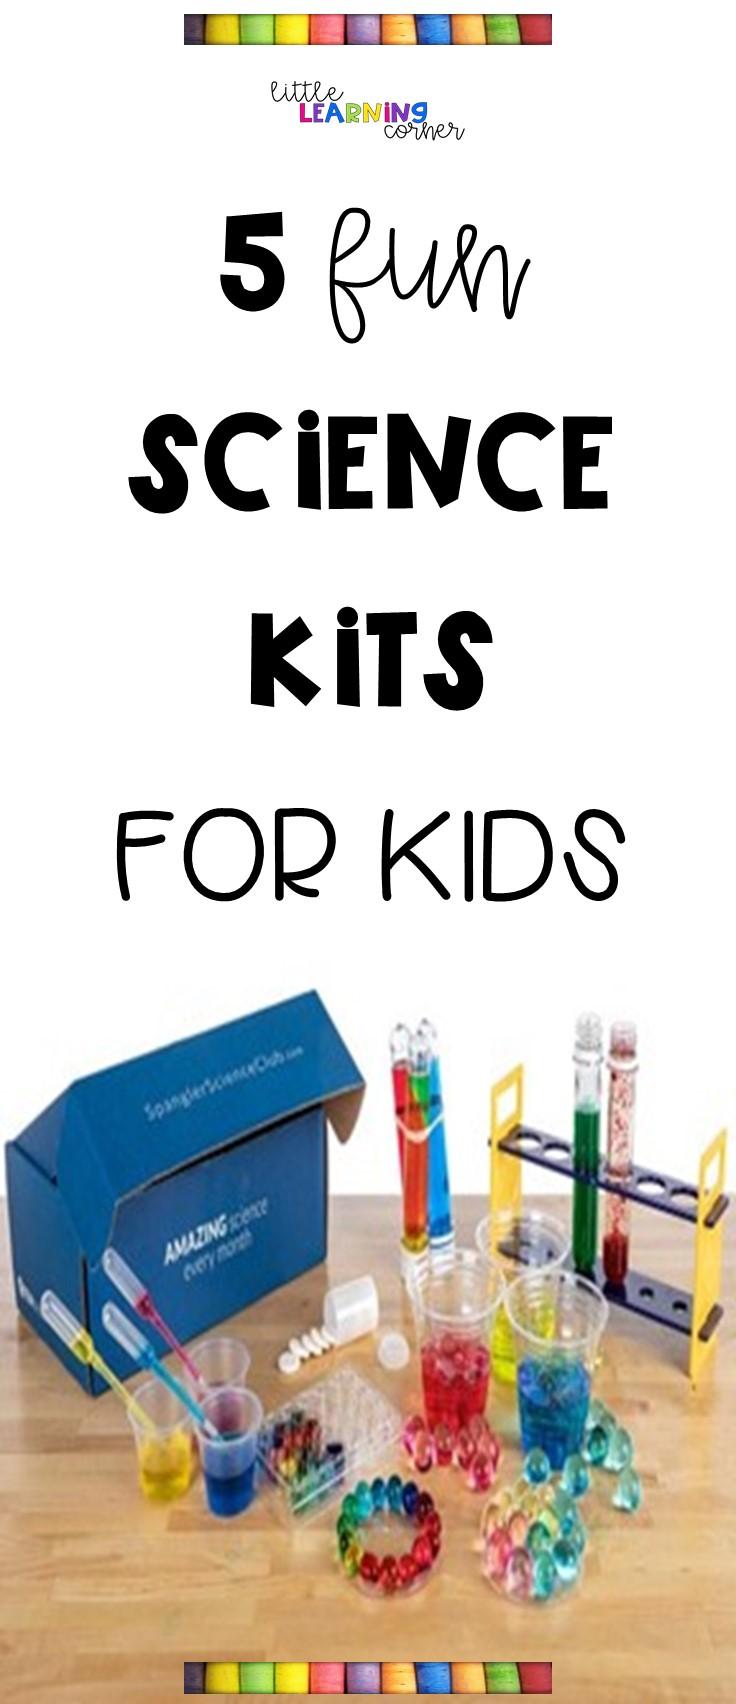 5 Fun Stem Science Kits For Kids Little Learning Corner